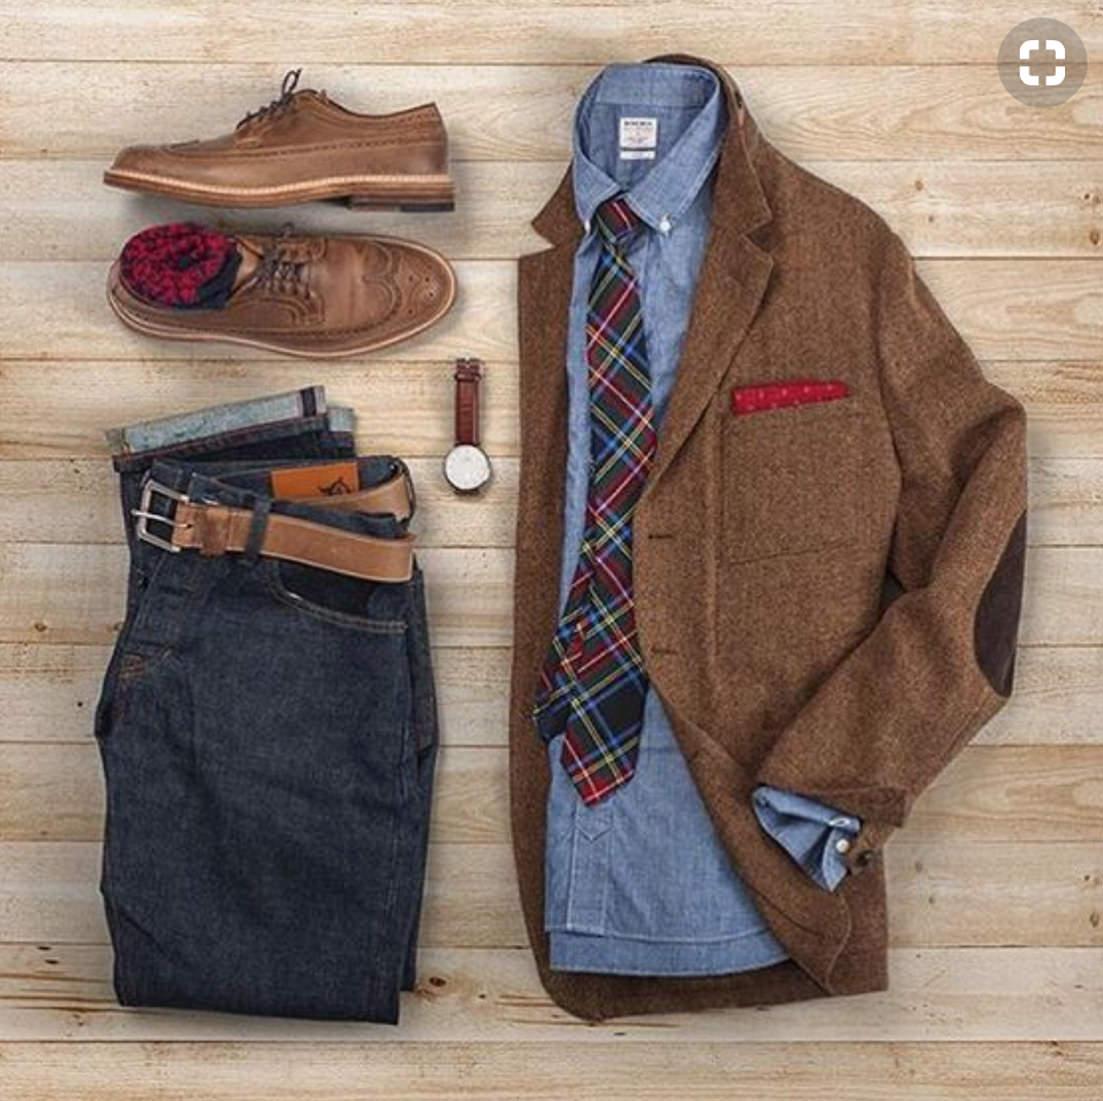 mens-outfit-set-2.jpg